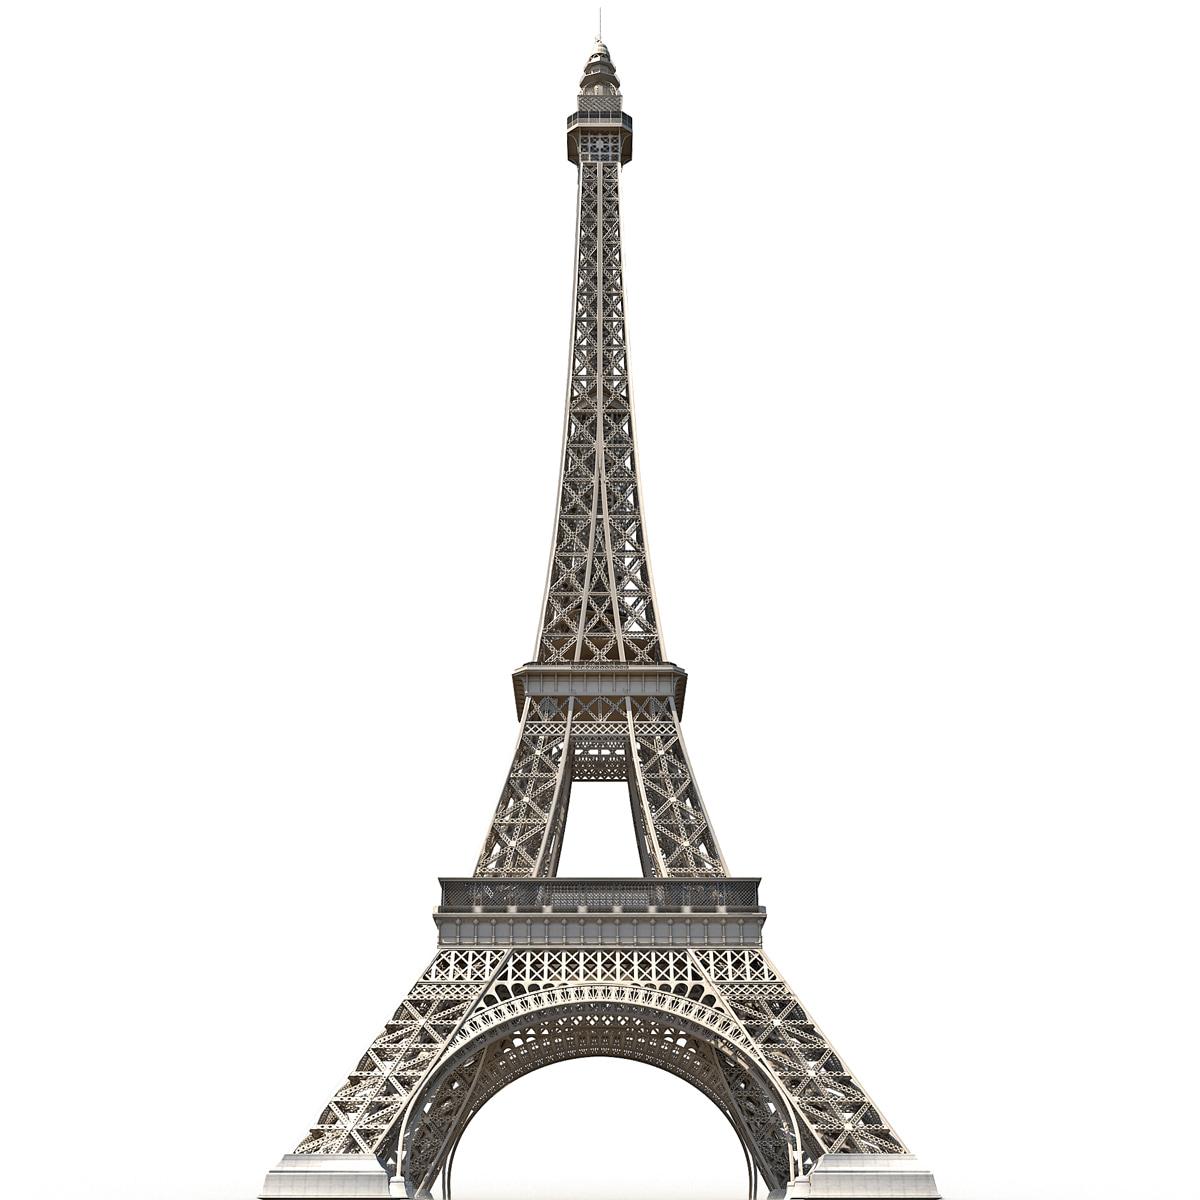 005 Eiffel Tower Low Poly Brand Dc